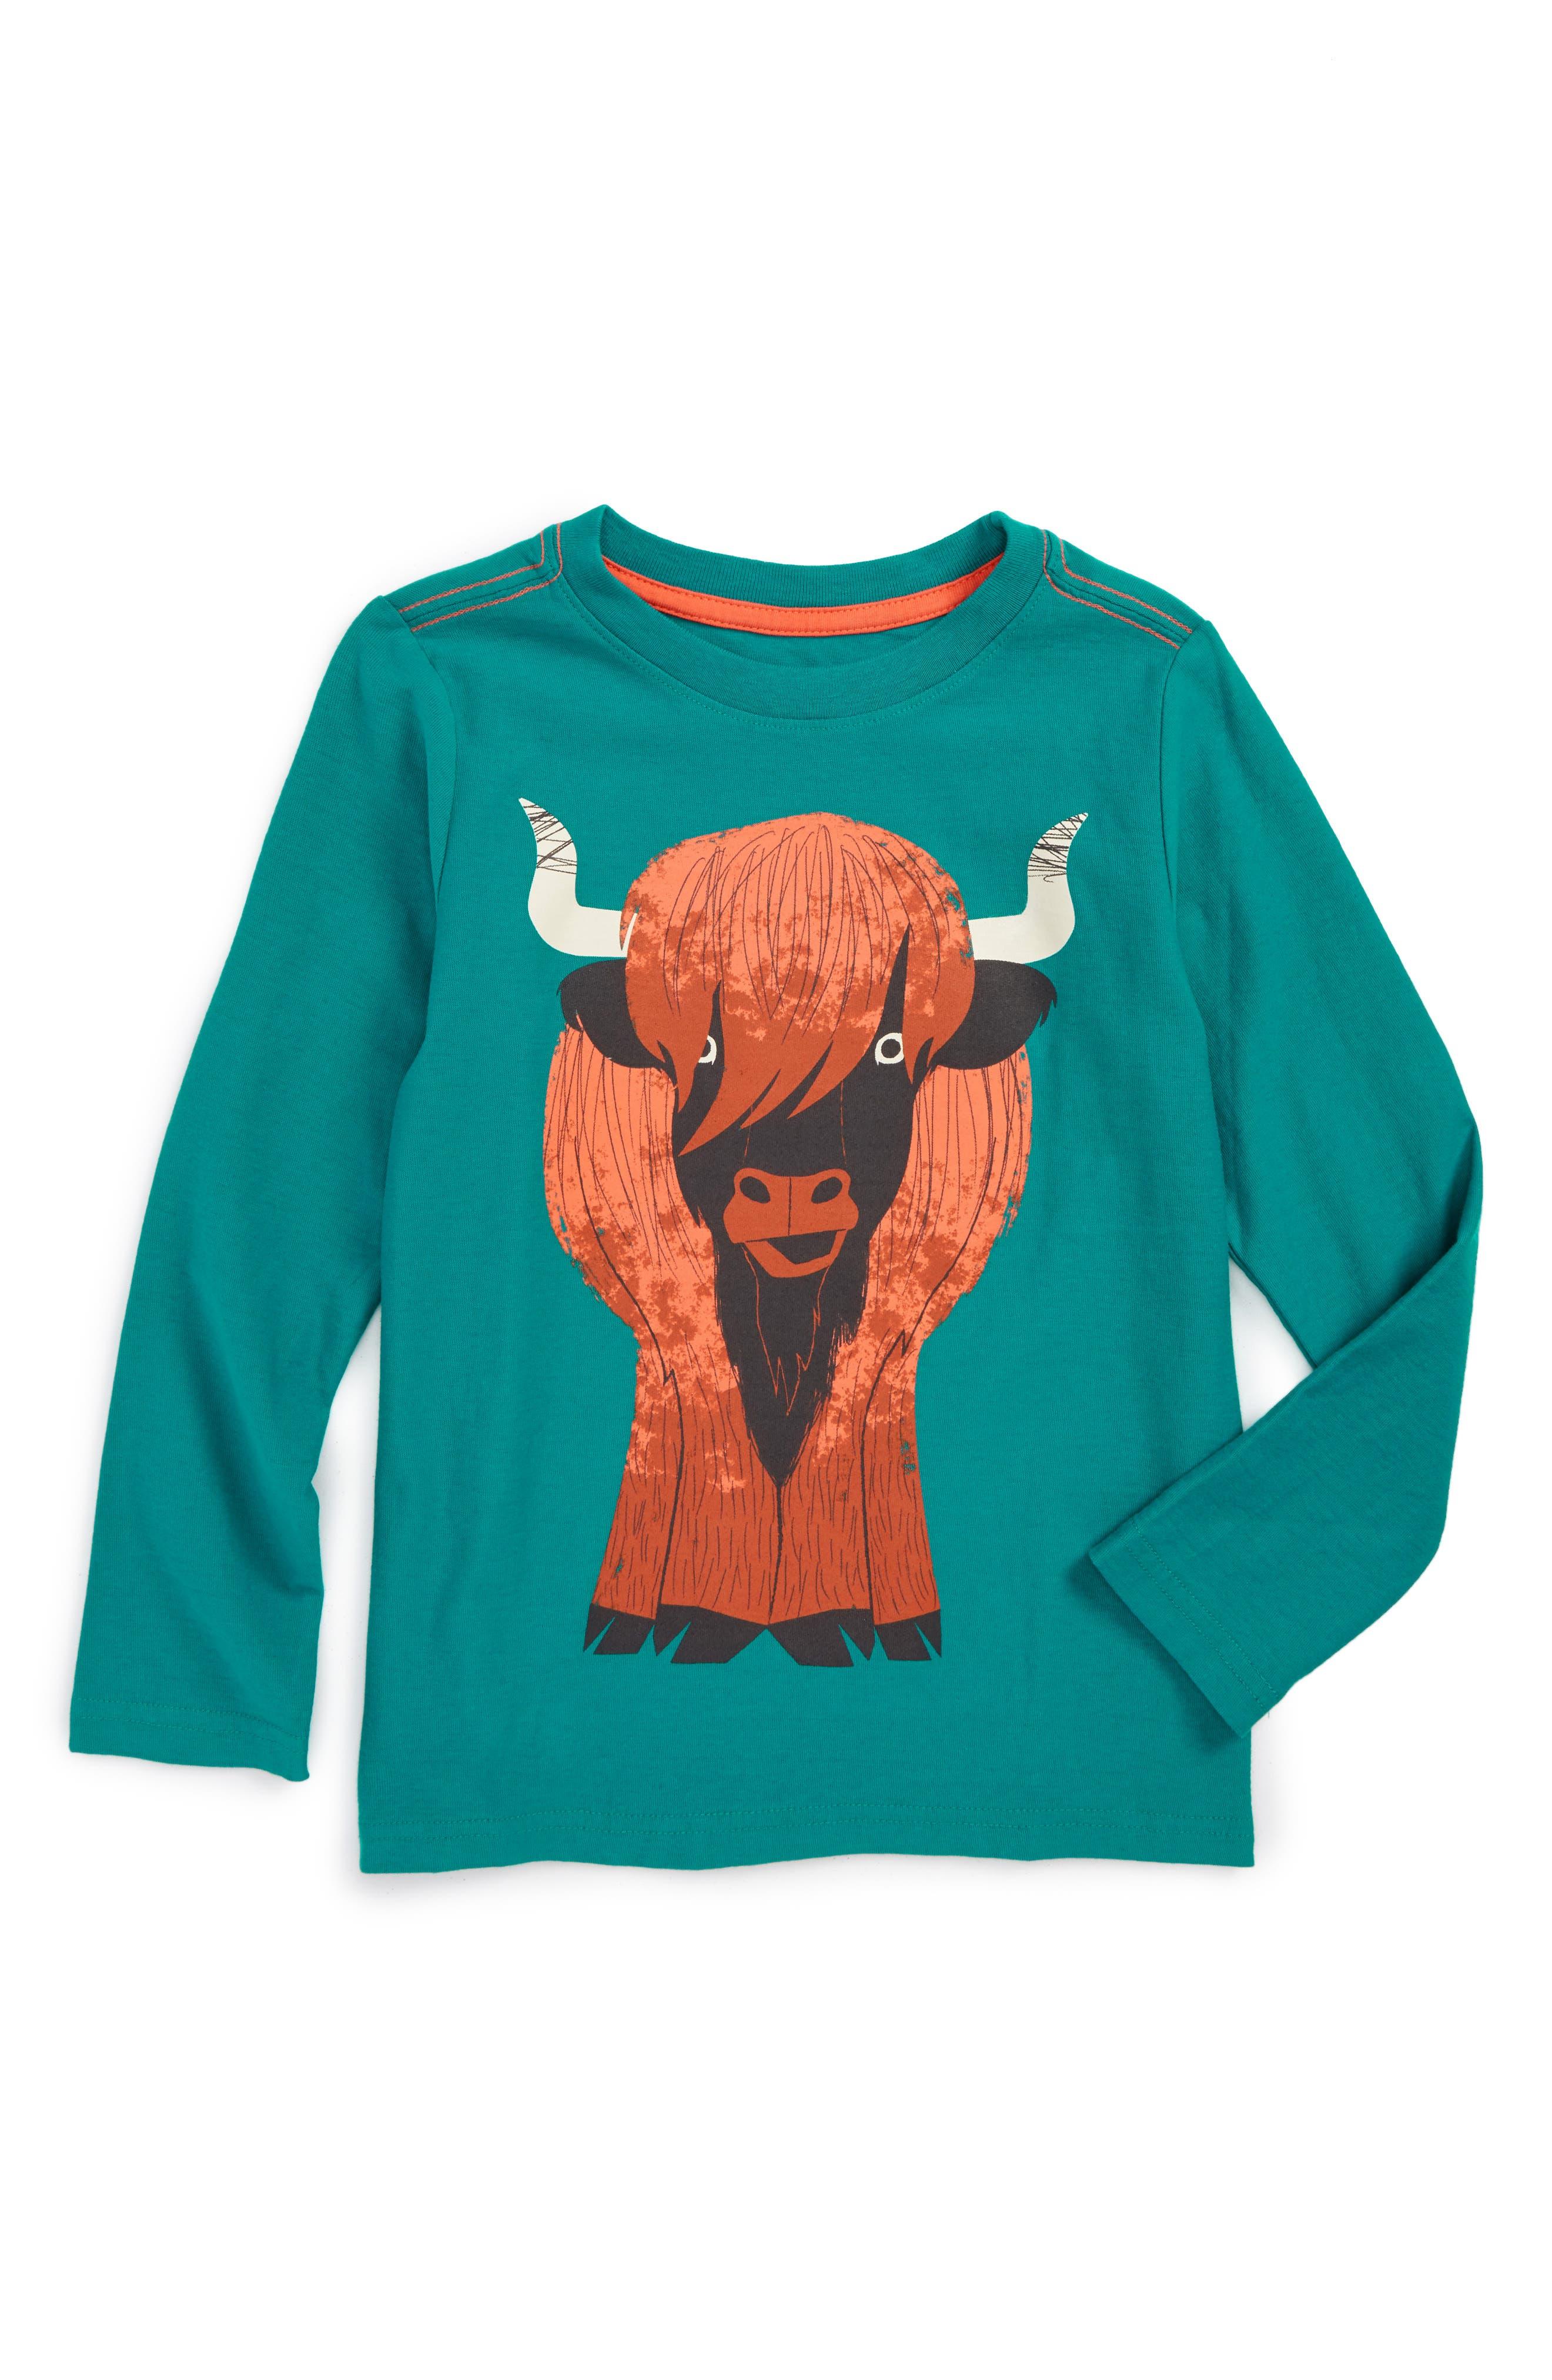 Tea Collection Heeland Coo Graphic T-Shirt (Toddler Boys & Little Boys)